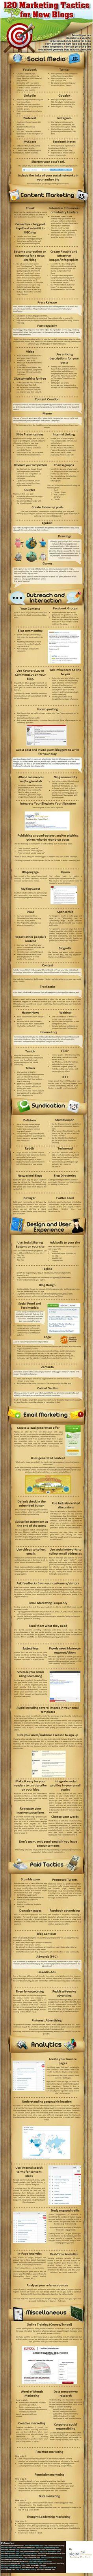 Tácticas de marketing para hacer un blog